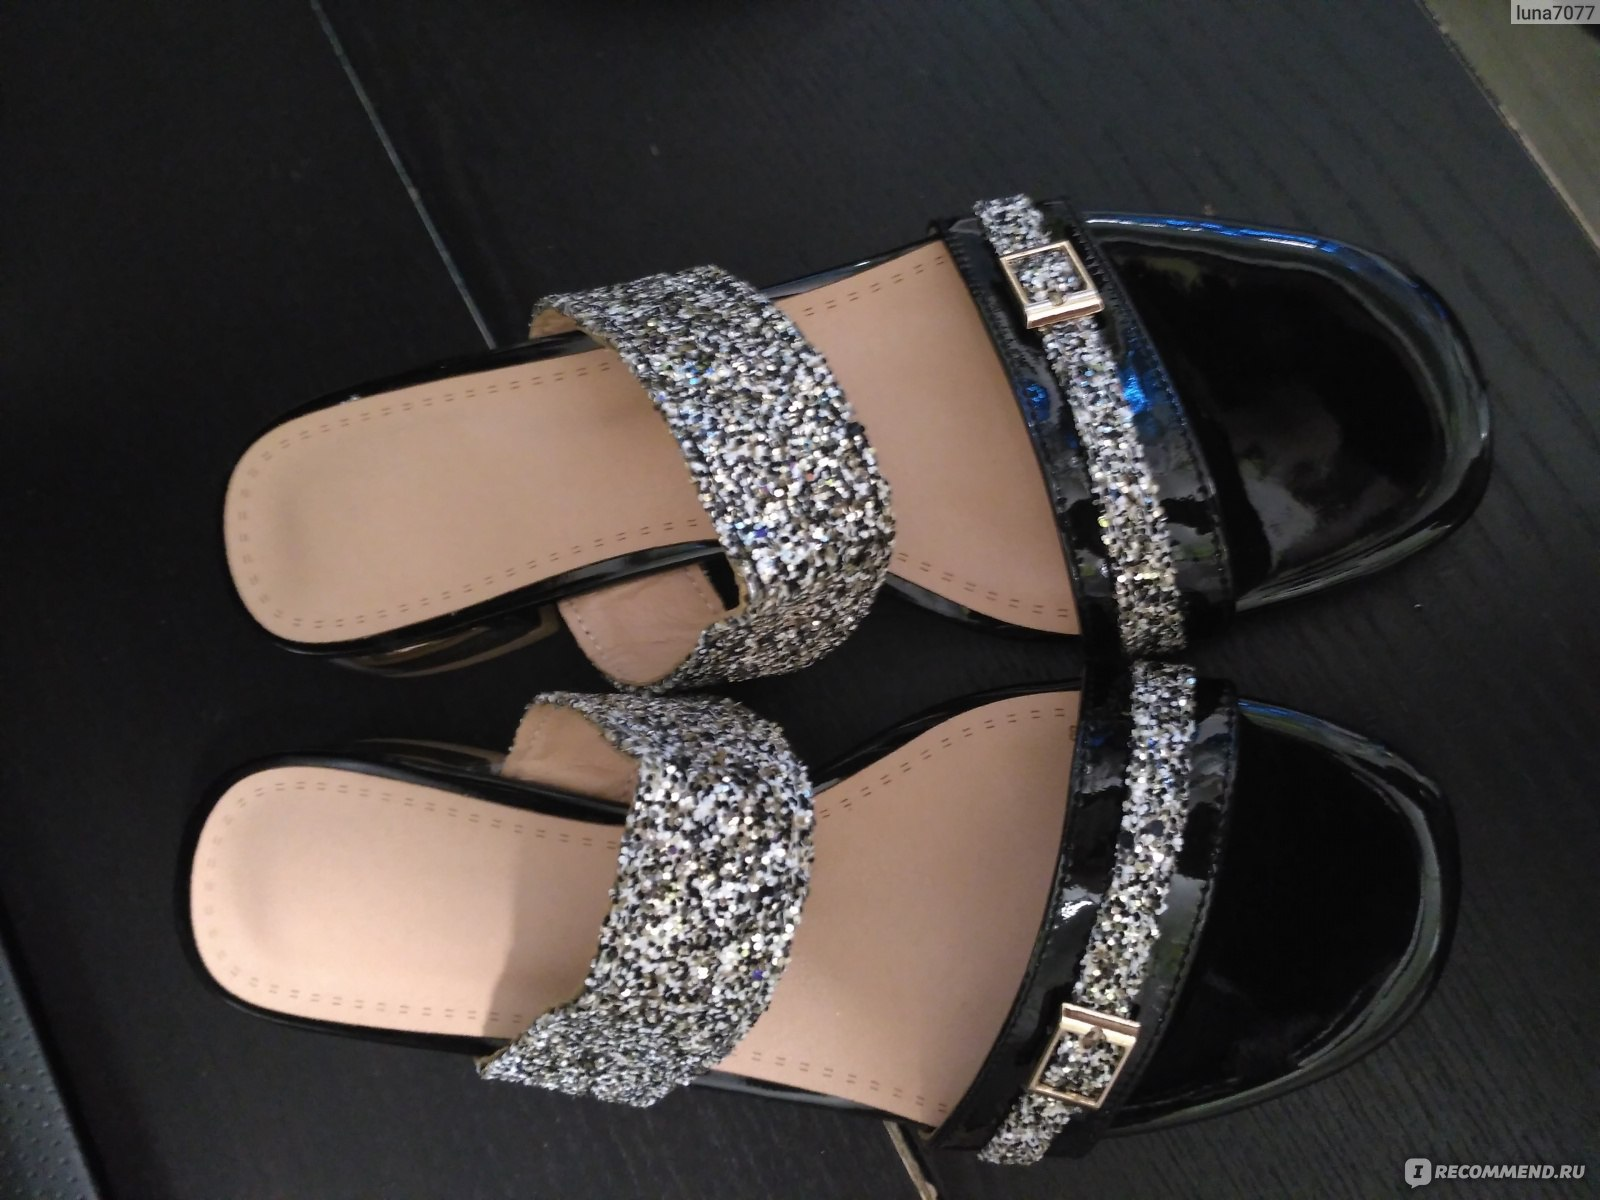 Босоножки Aliexpress Meotina Women Sandals Summer 2017 Women Slides Glitter  Low Heel Slippers Causal Beach Shoes be2dfcfb037b